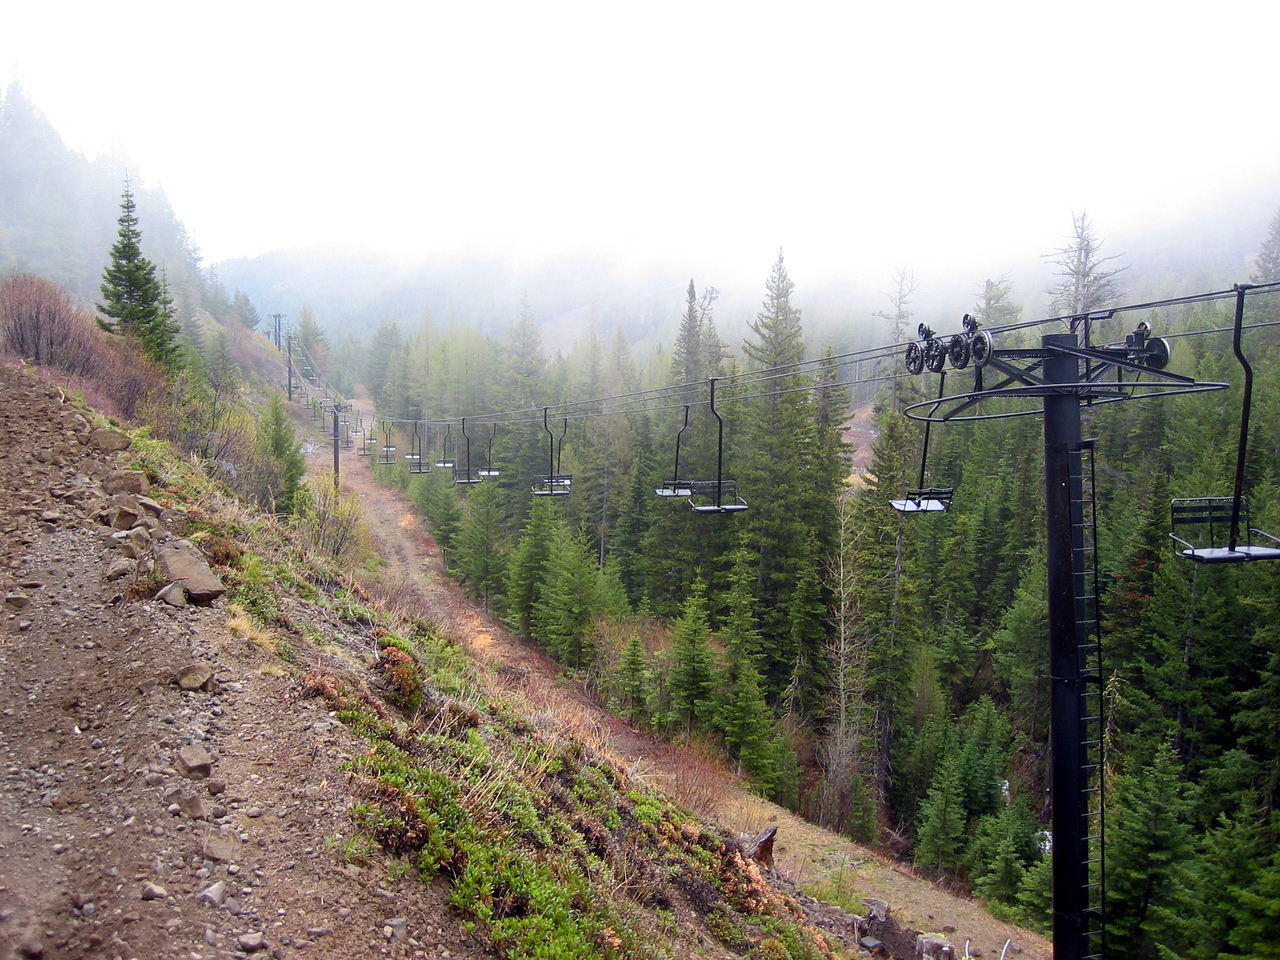 ski lift at mission ridge